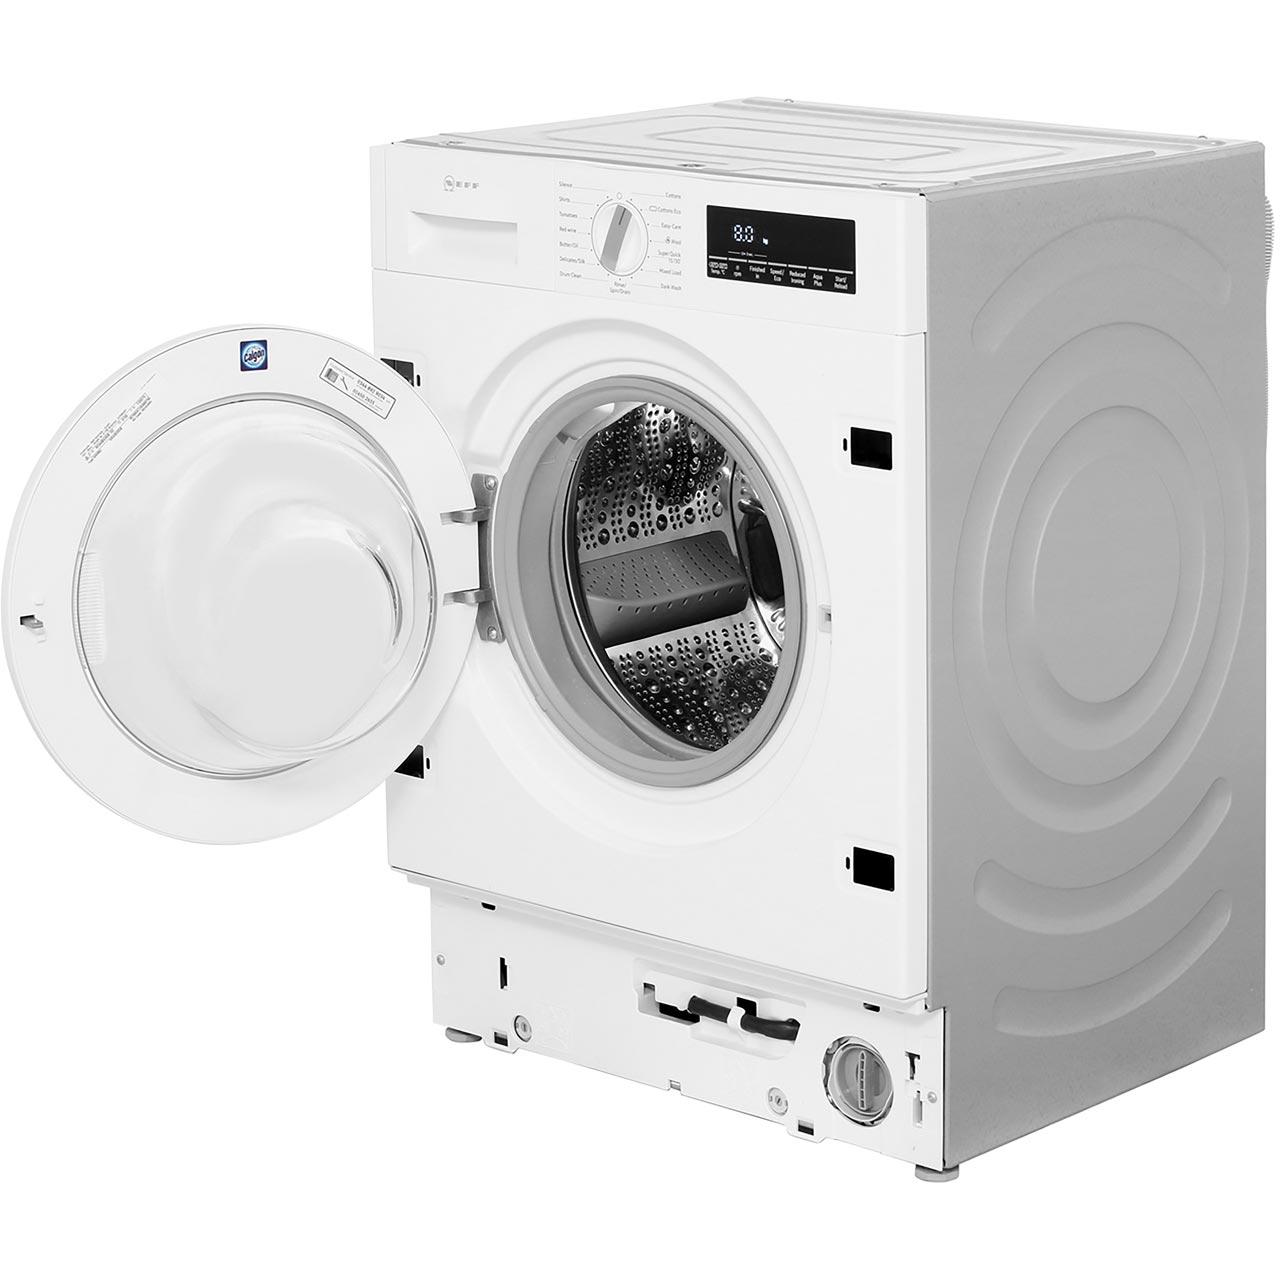 Neff W544bx0gb A    Rated 8kg 1400 Rpm Washing Machine